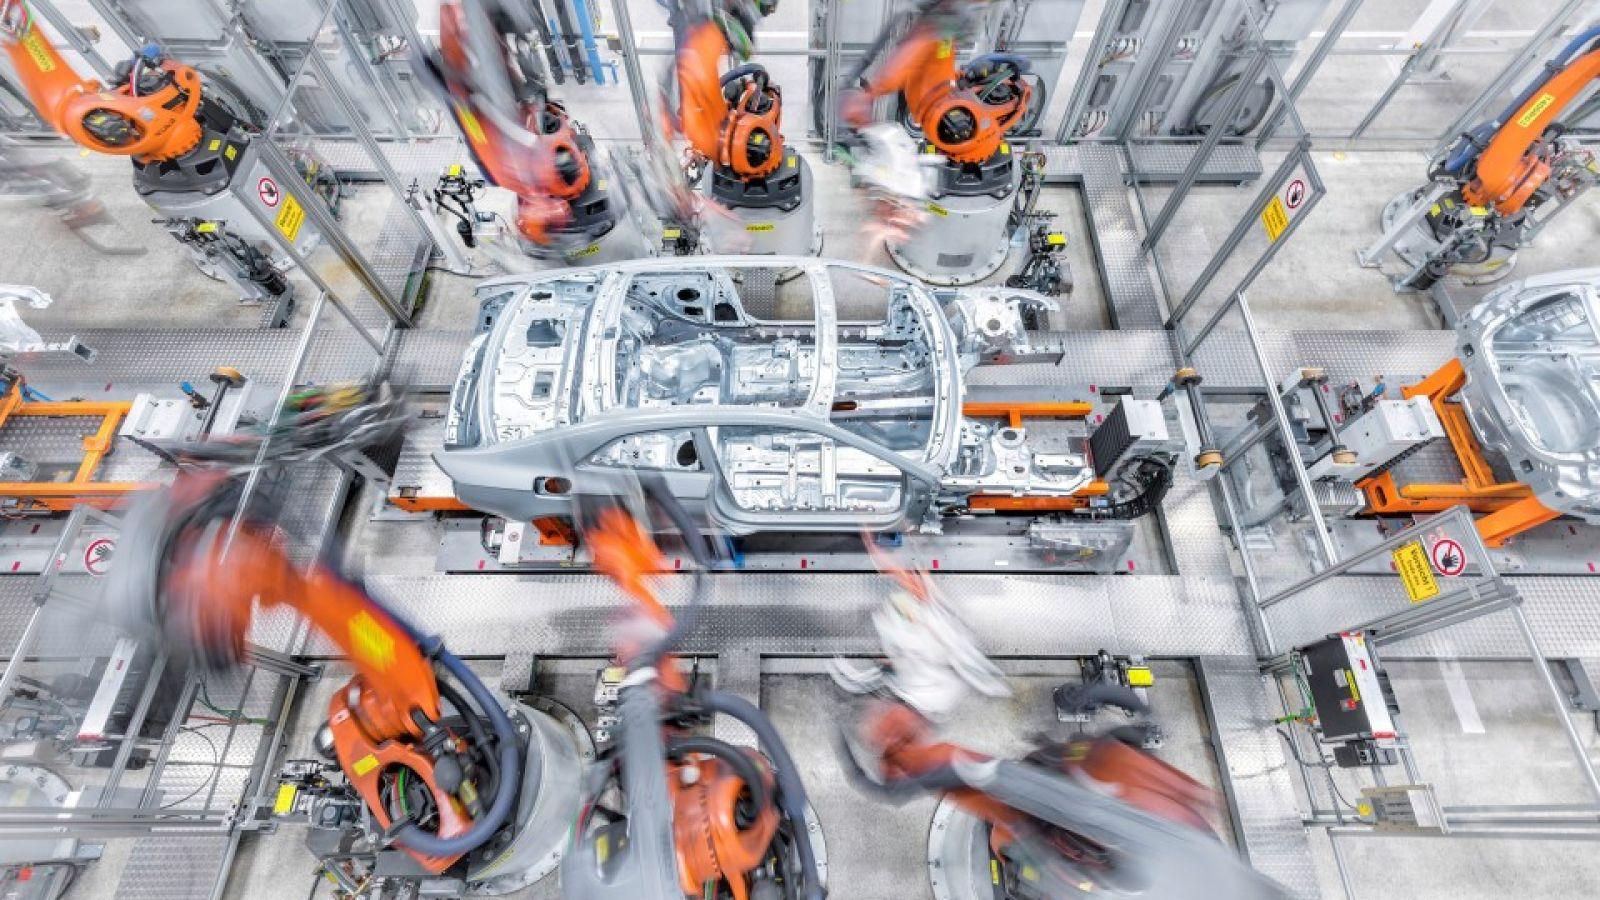 Fabricacion de coches